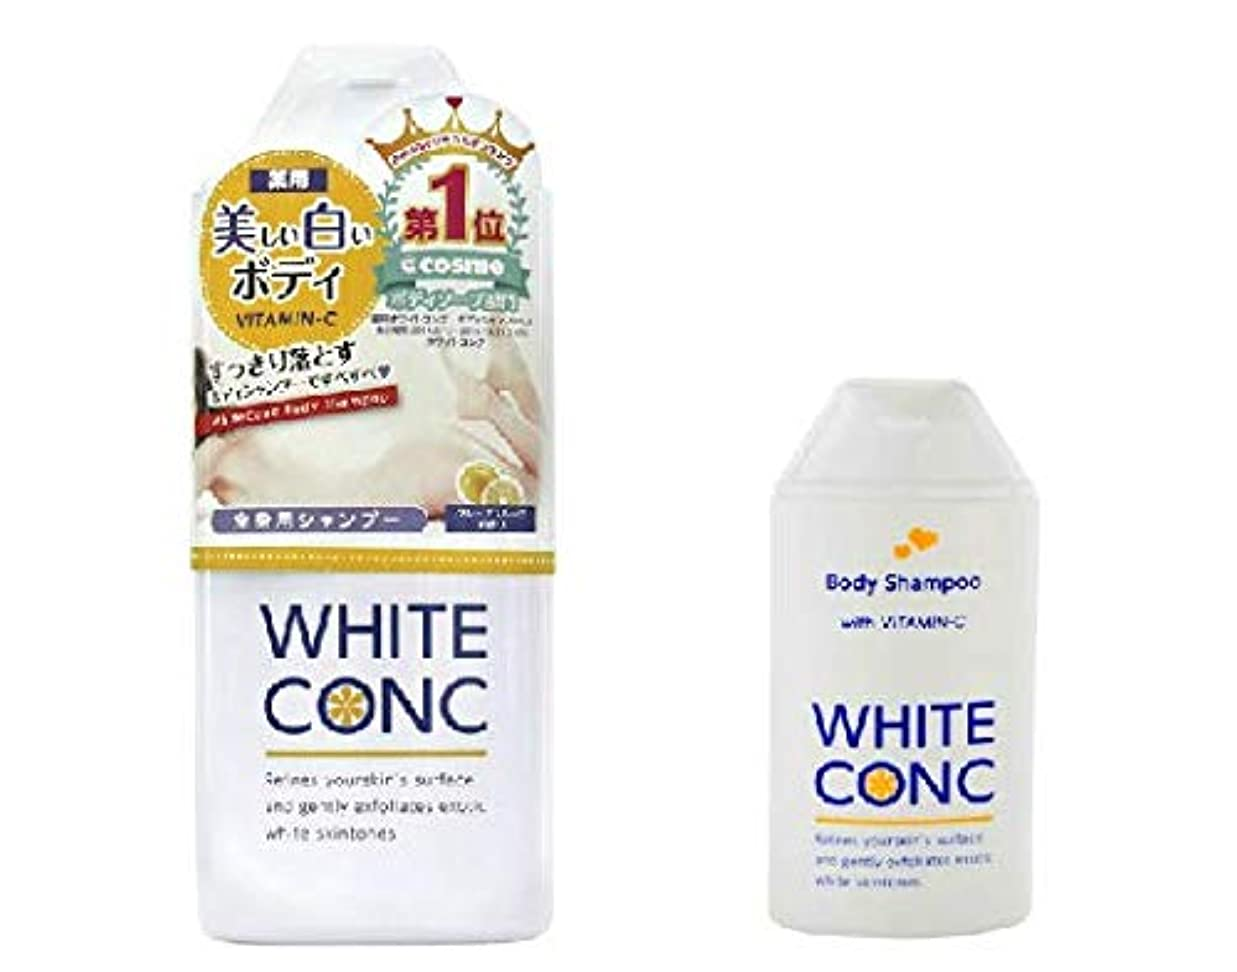 【WHITE CONC(ホワイトコンク)】 ボディシャンプーC Ⅱ_360mL1本&150mL1本